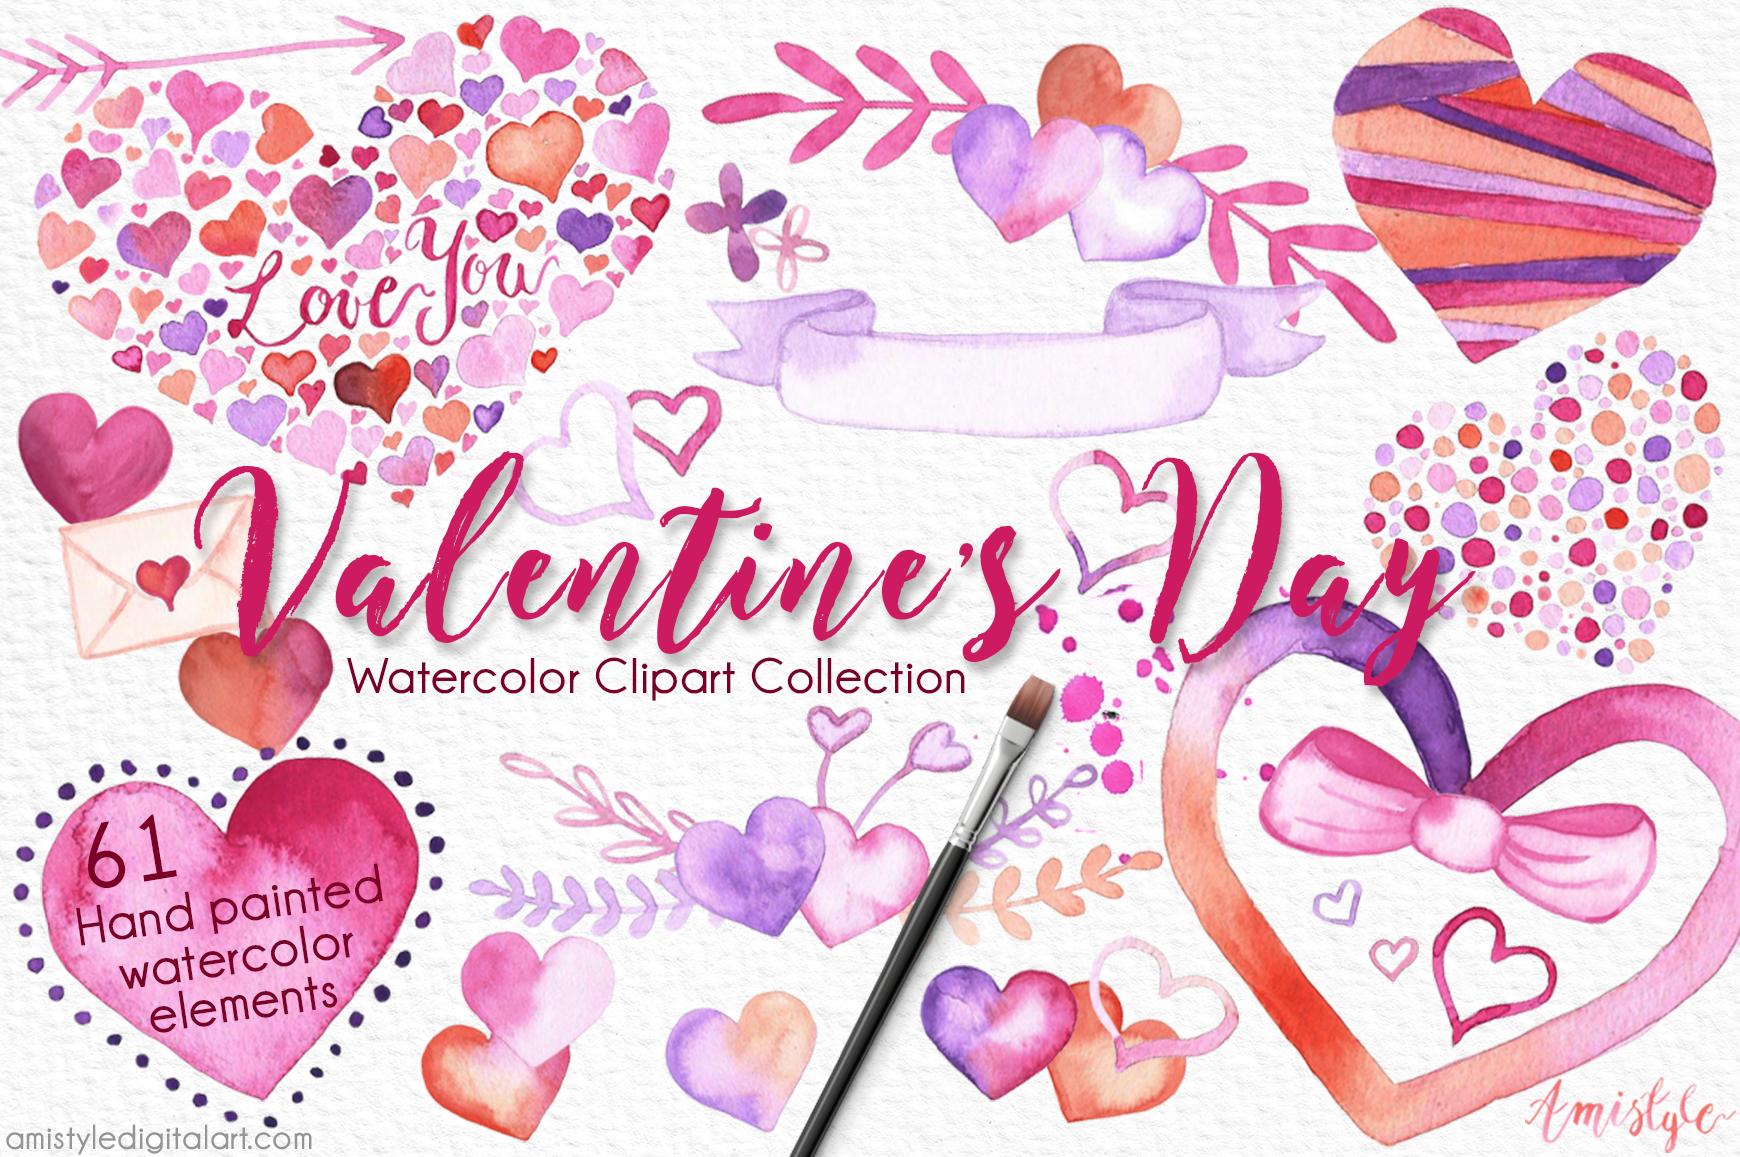 Valentine s watercolor set. 2017 clipart valentine's day